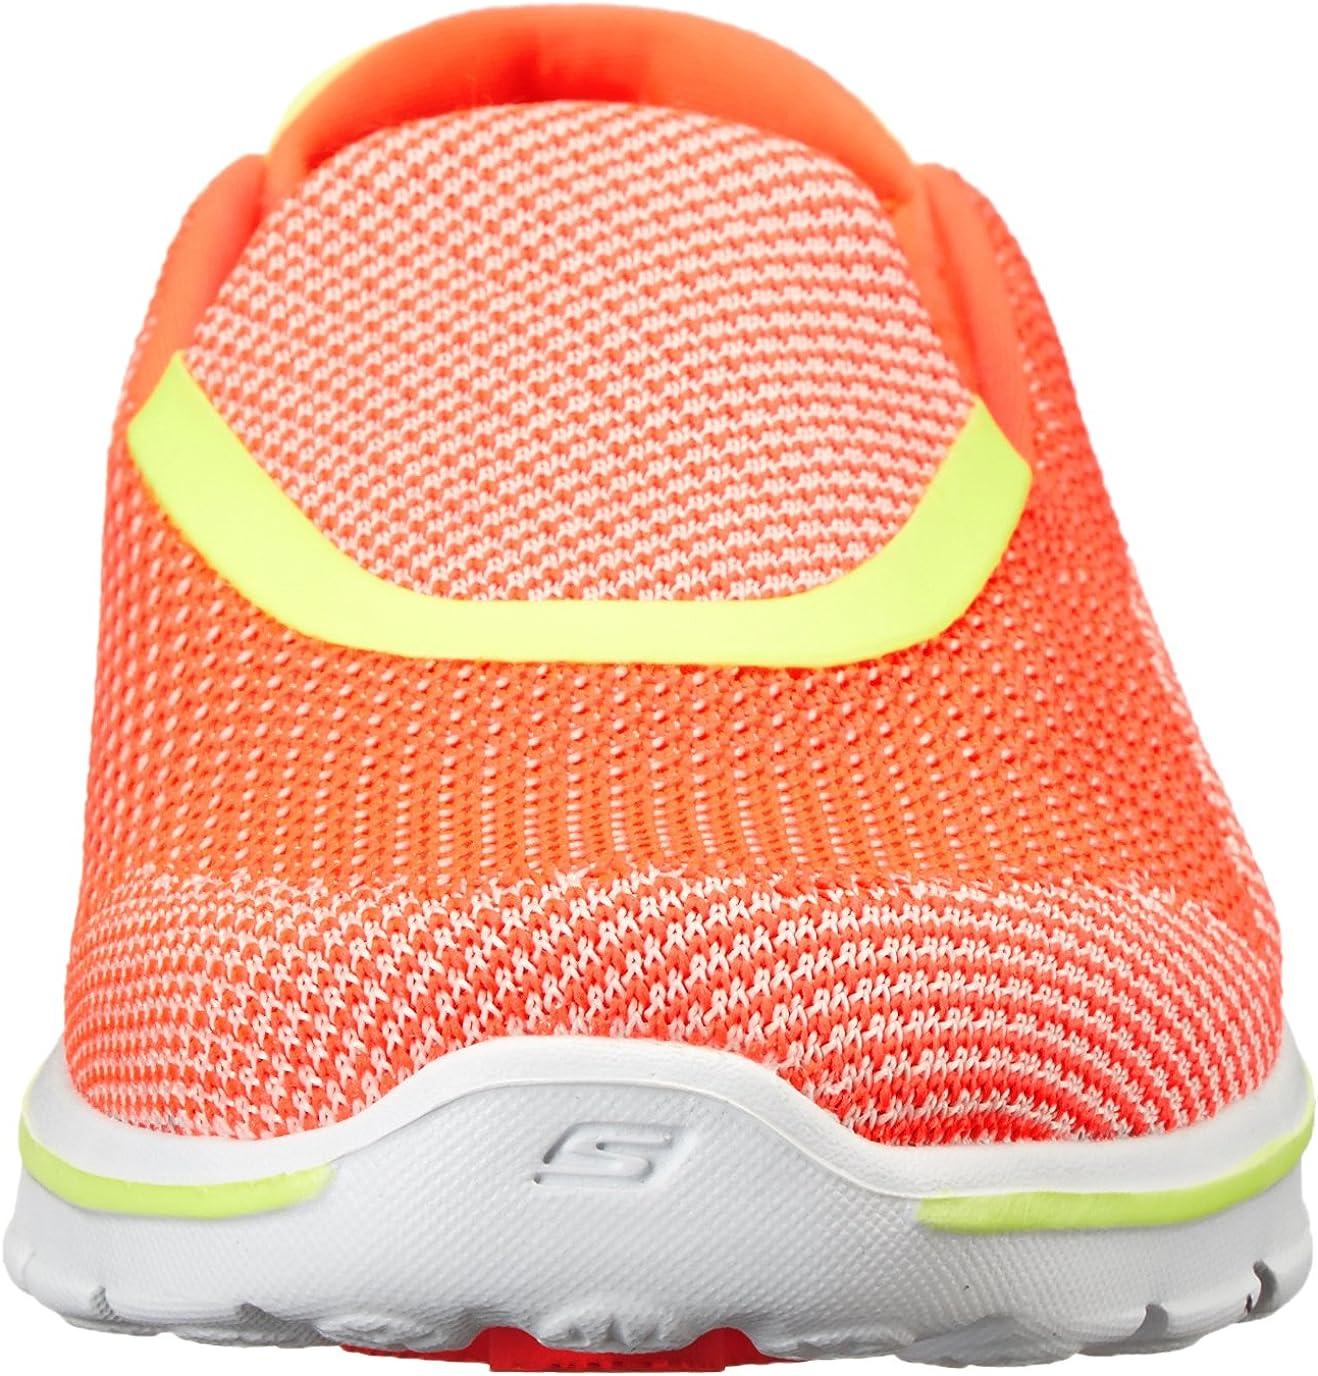 Skechers Performance Women's Go Walk 3 Slip-On Walking Shoe Hot Pink/Lime Nite Owl